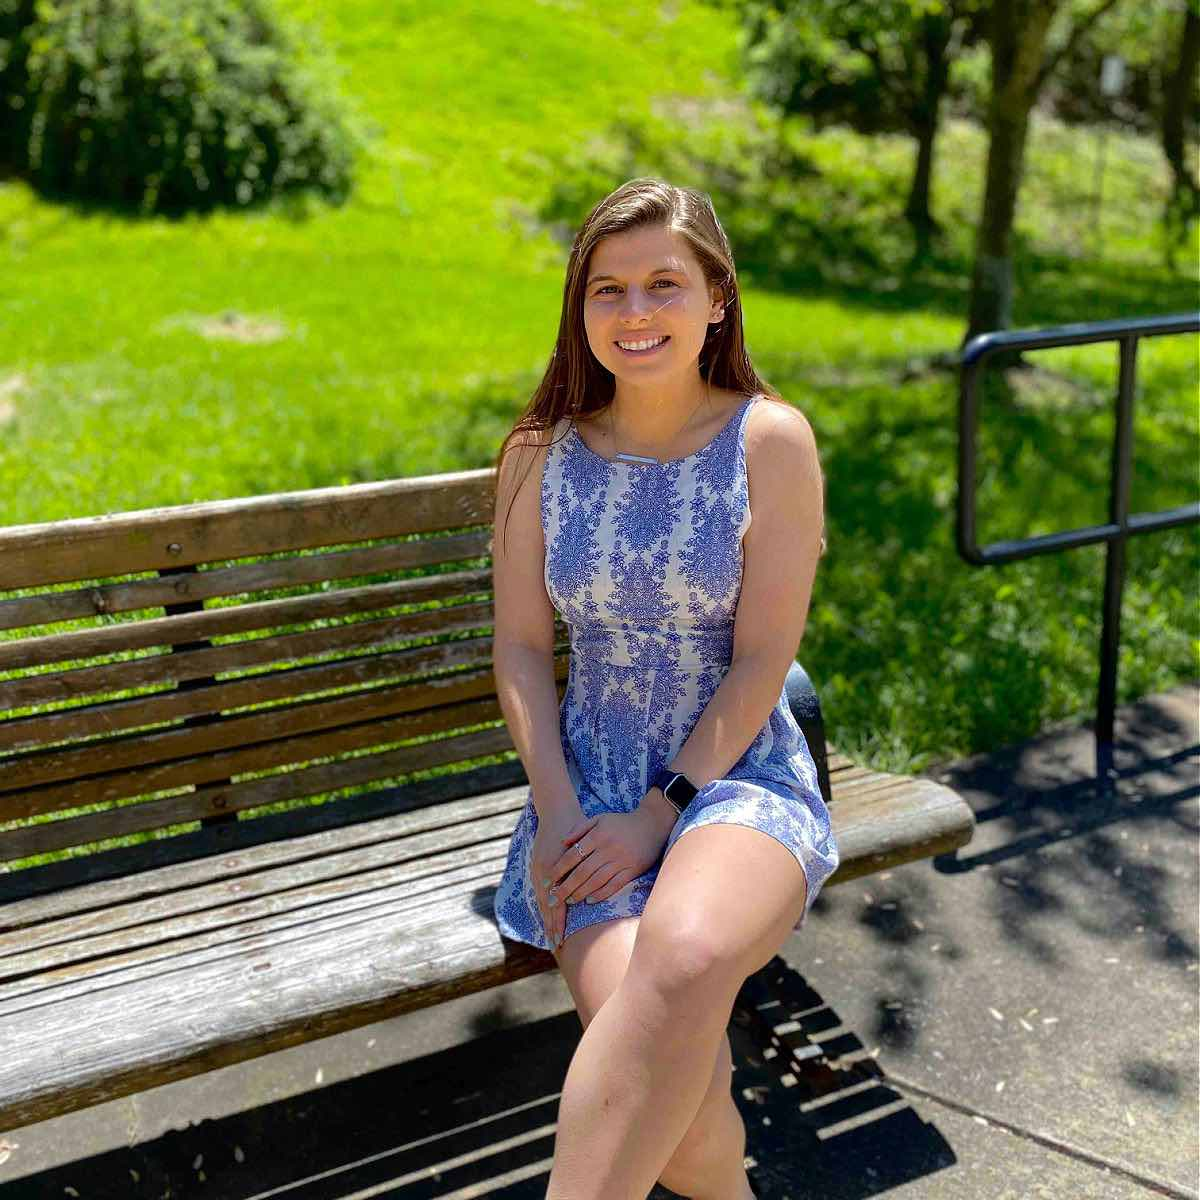 Photo of Carly Waldman sitting on a bench.